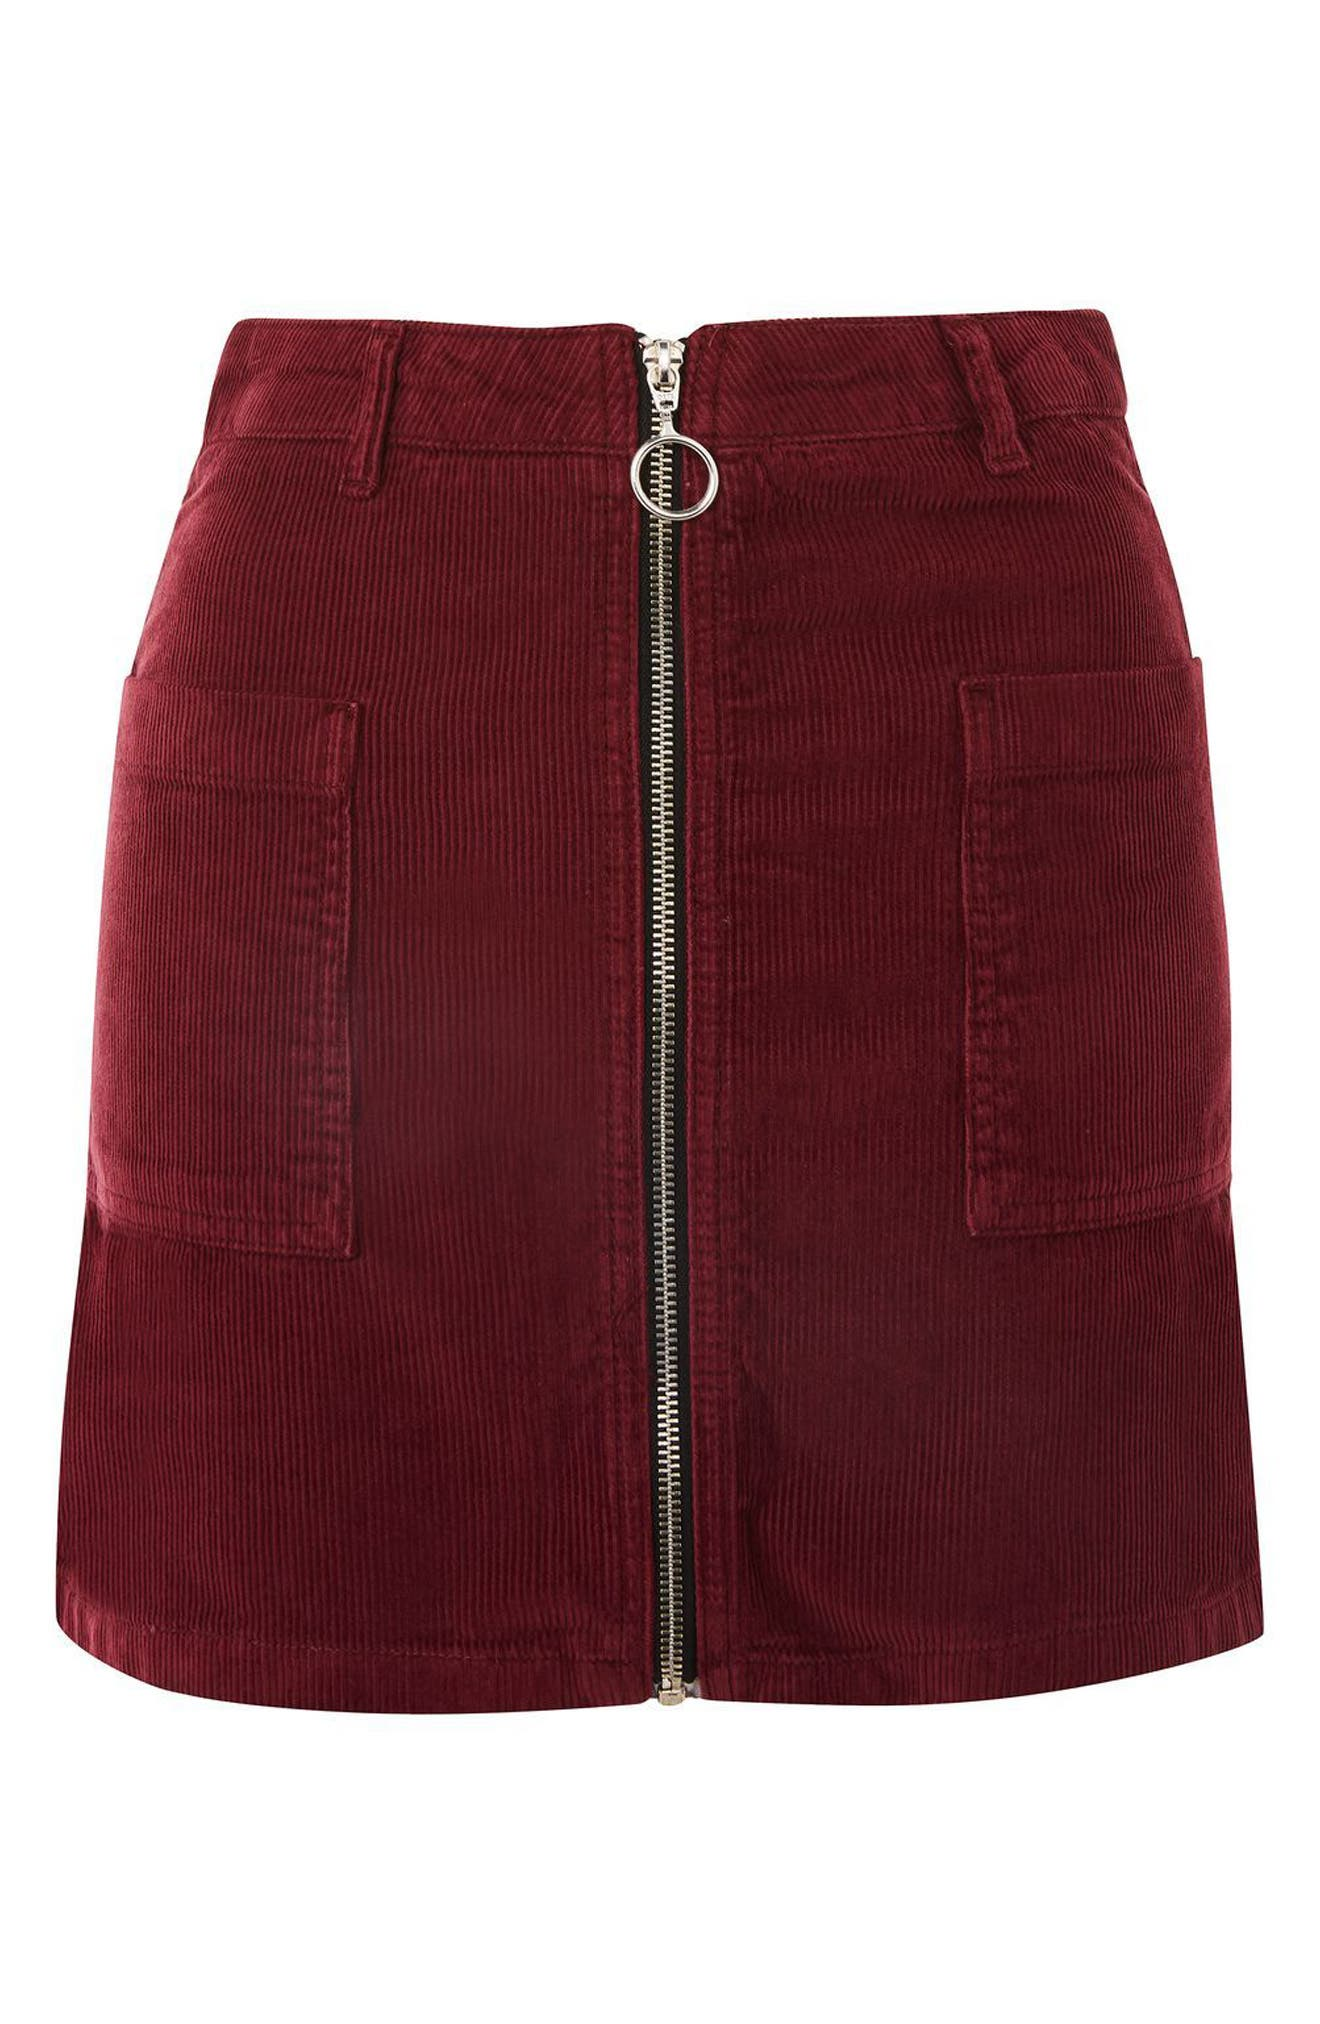 Zip Through Corduroy Skirt,                             Alternate thumbnail 3, color,                             Burgundy